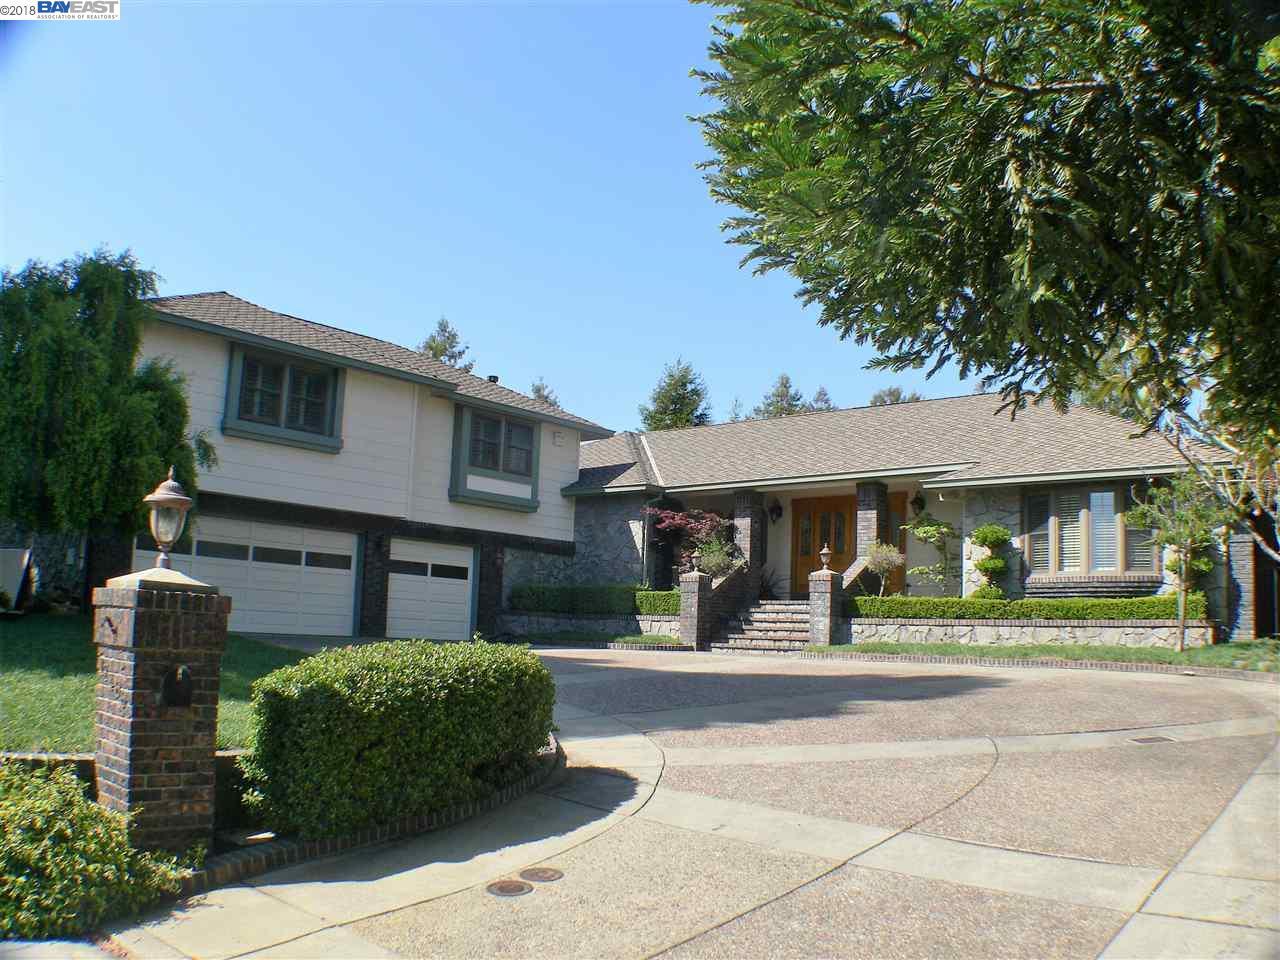 17466 ALMOND RD, CASTRO VALLEY, CA 94546